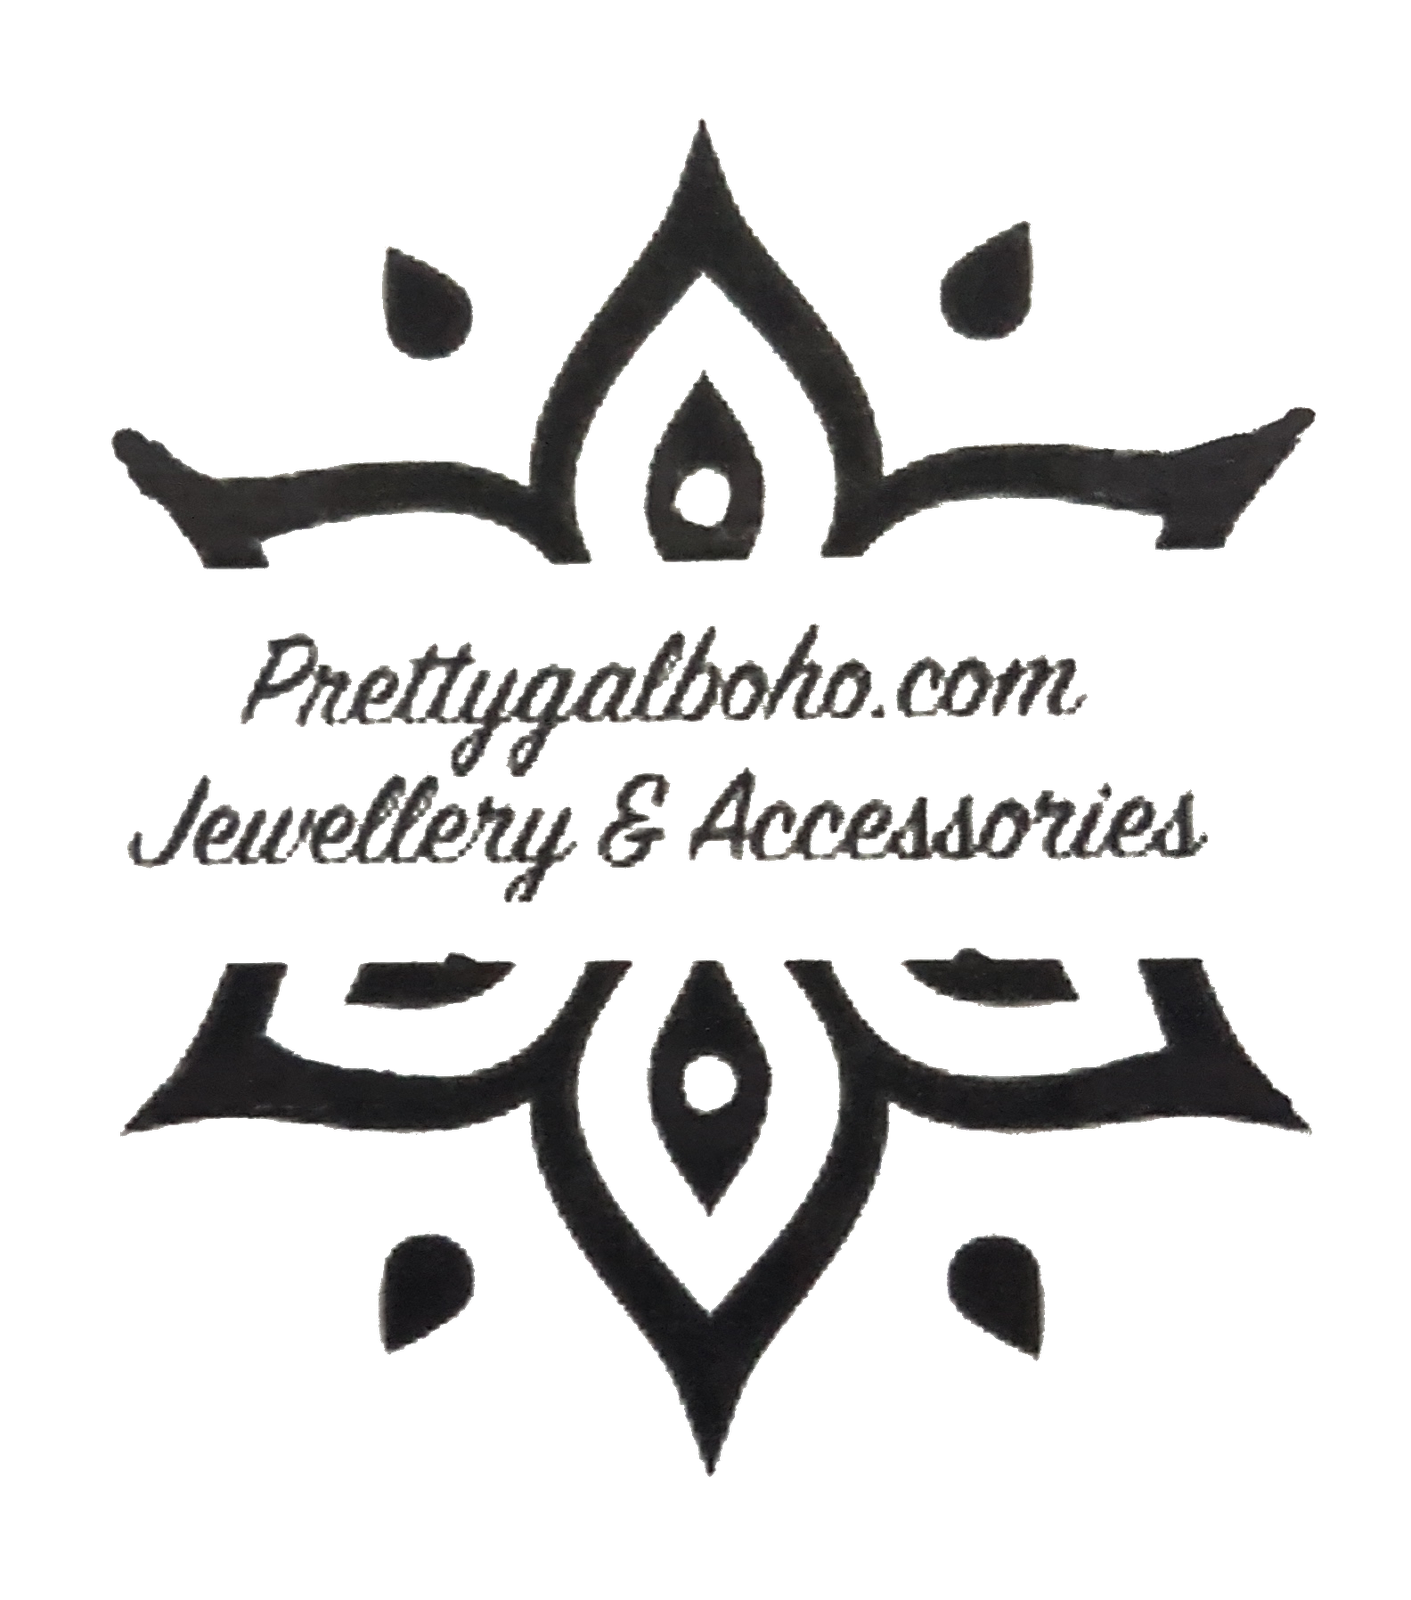 Prettygalboho Logo